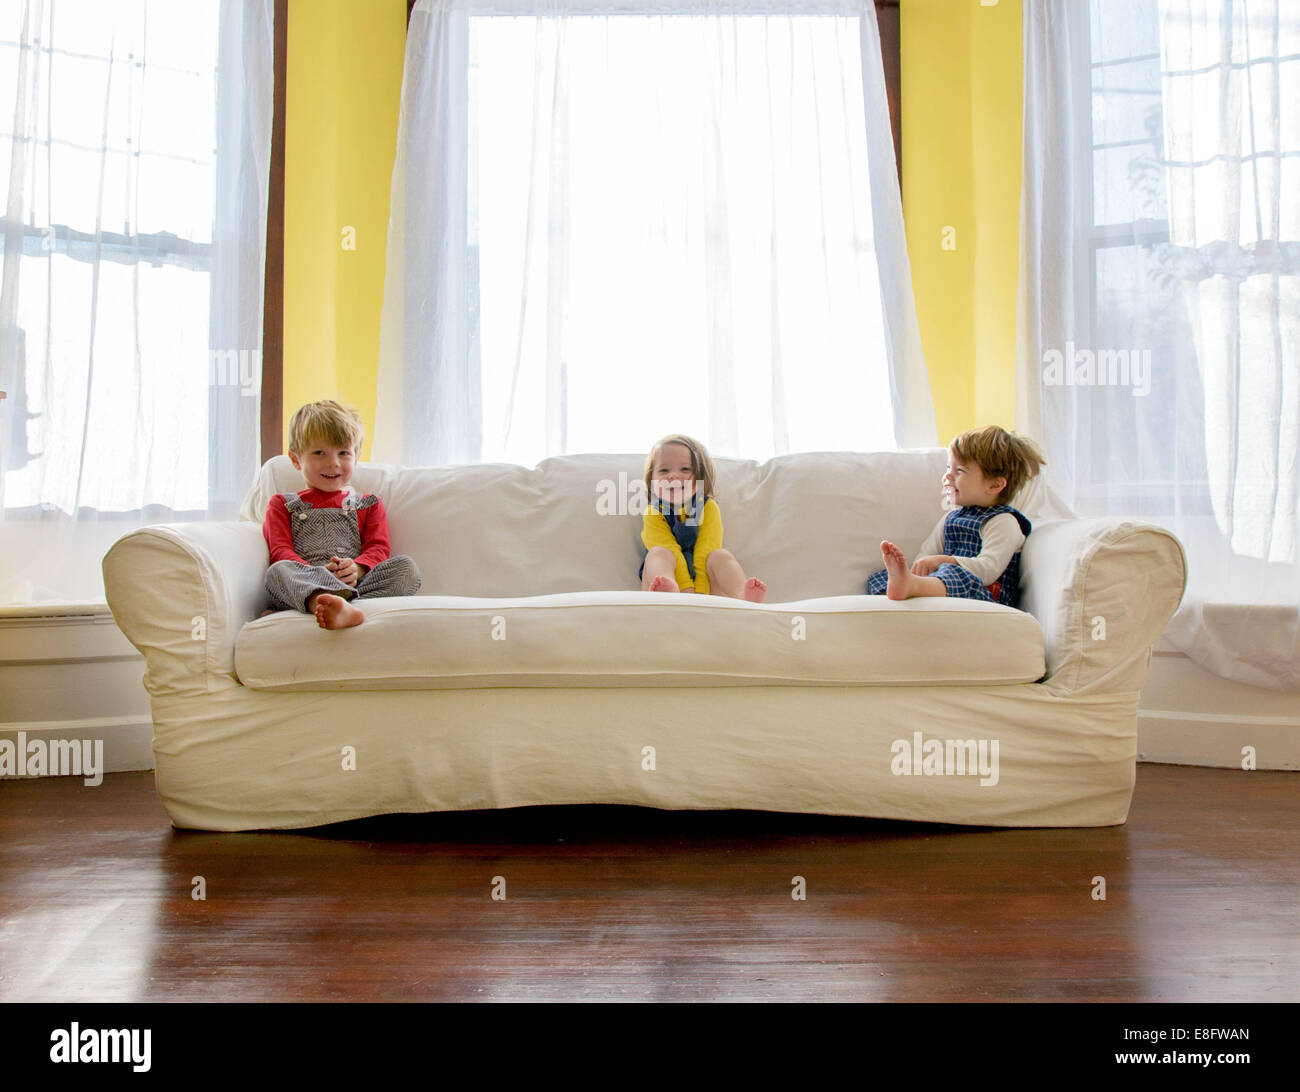 Children ( 2-3, 4-5 ) sitting on sofa - Stock Image